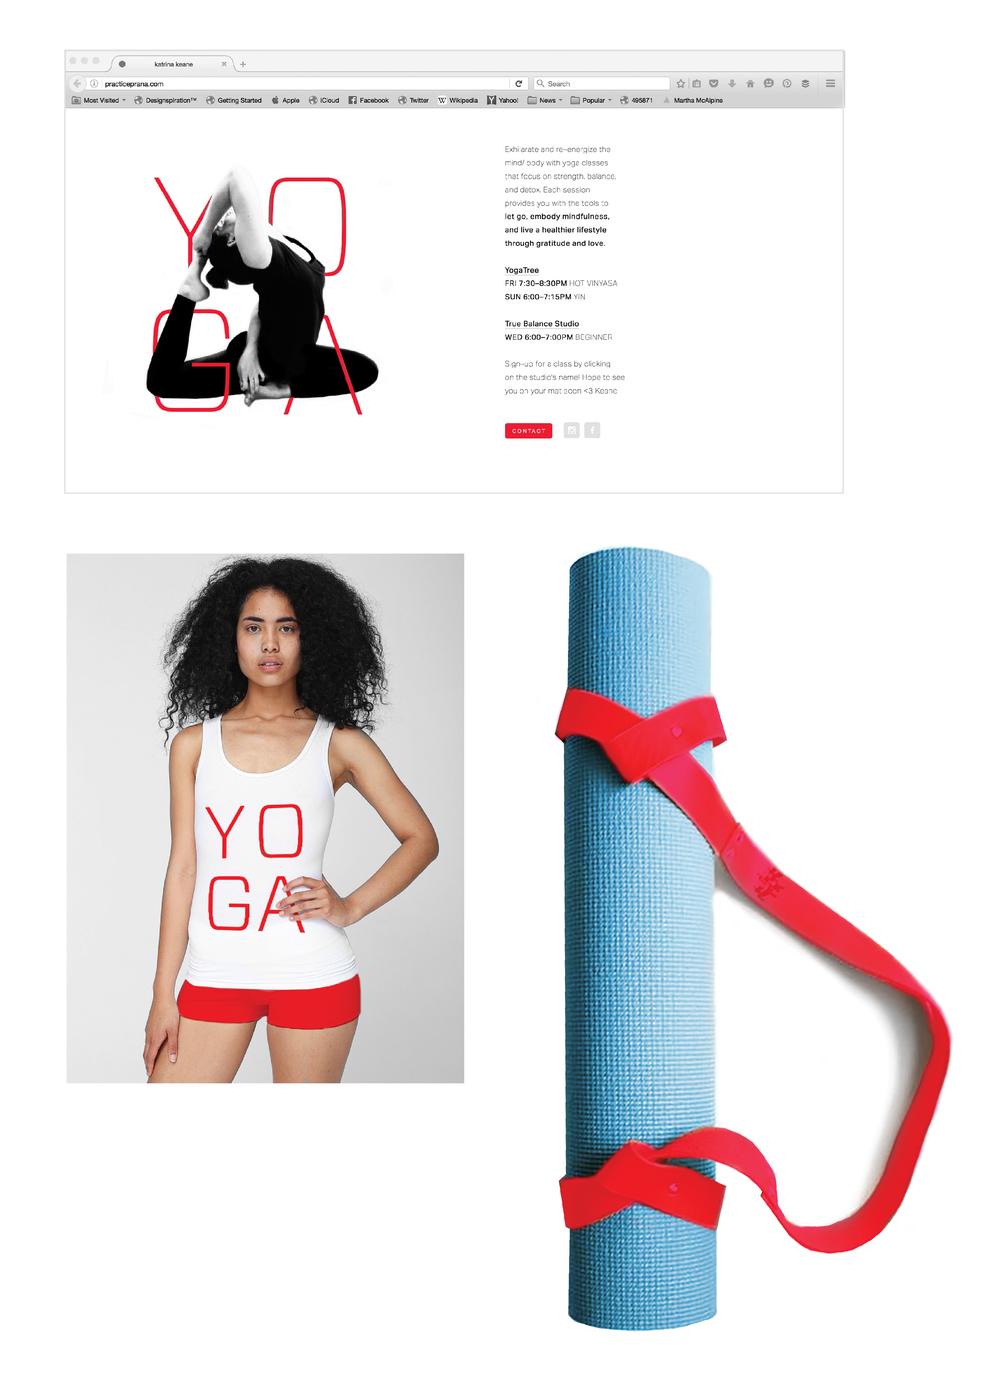 Yoga Brand 2-02.jpg